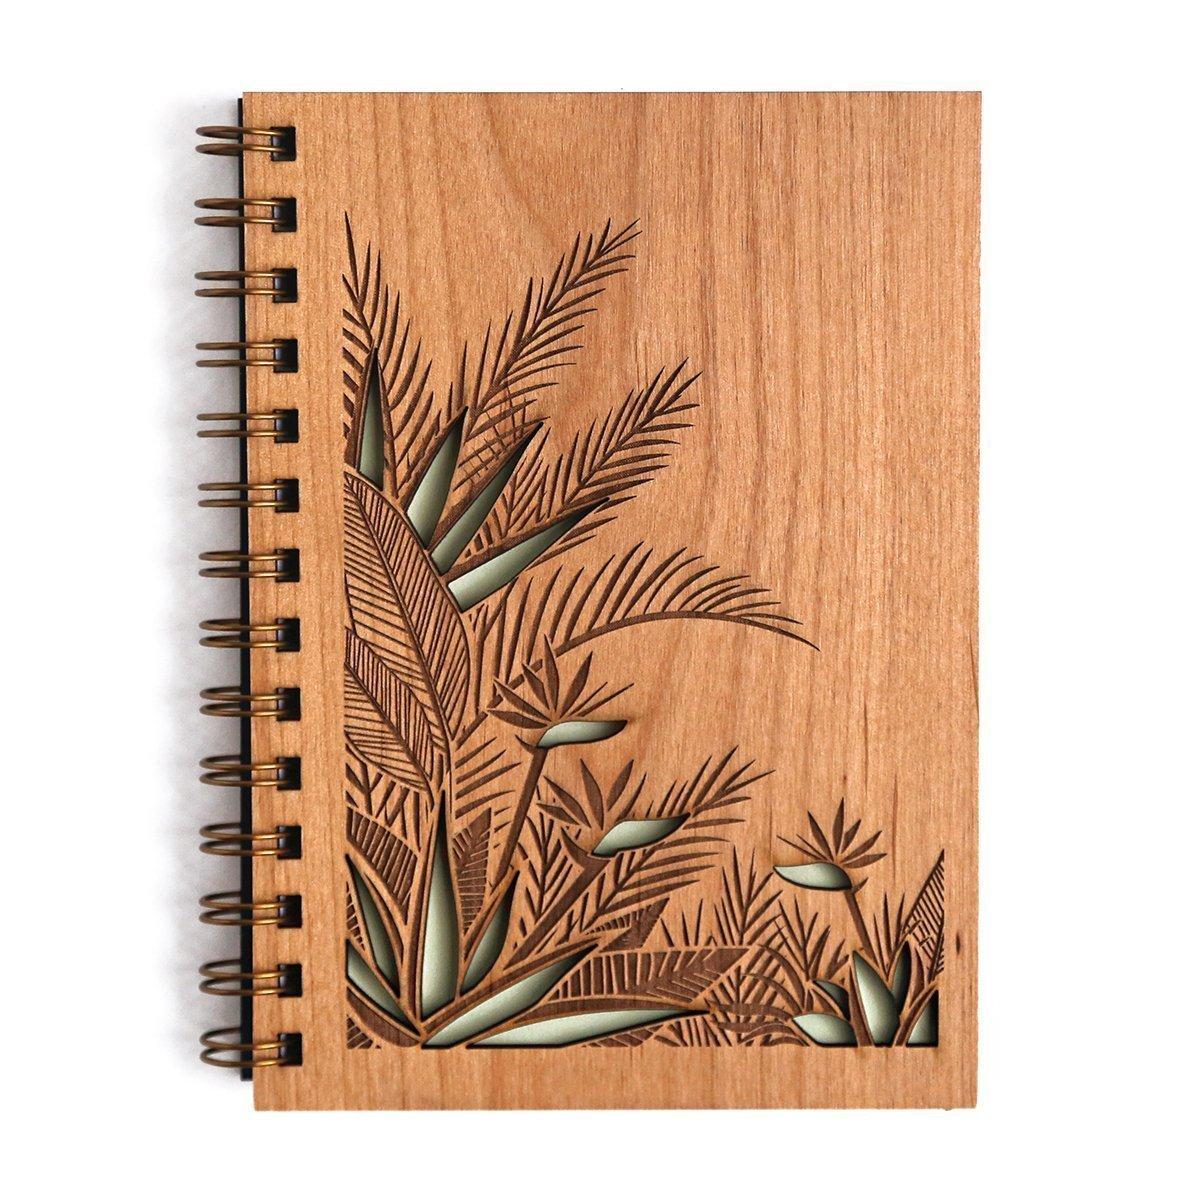 Birds of Paradise Laser Cut Wood Journal (Notebook/Birthday Gift/Gratitude Journal/Handmade)